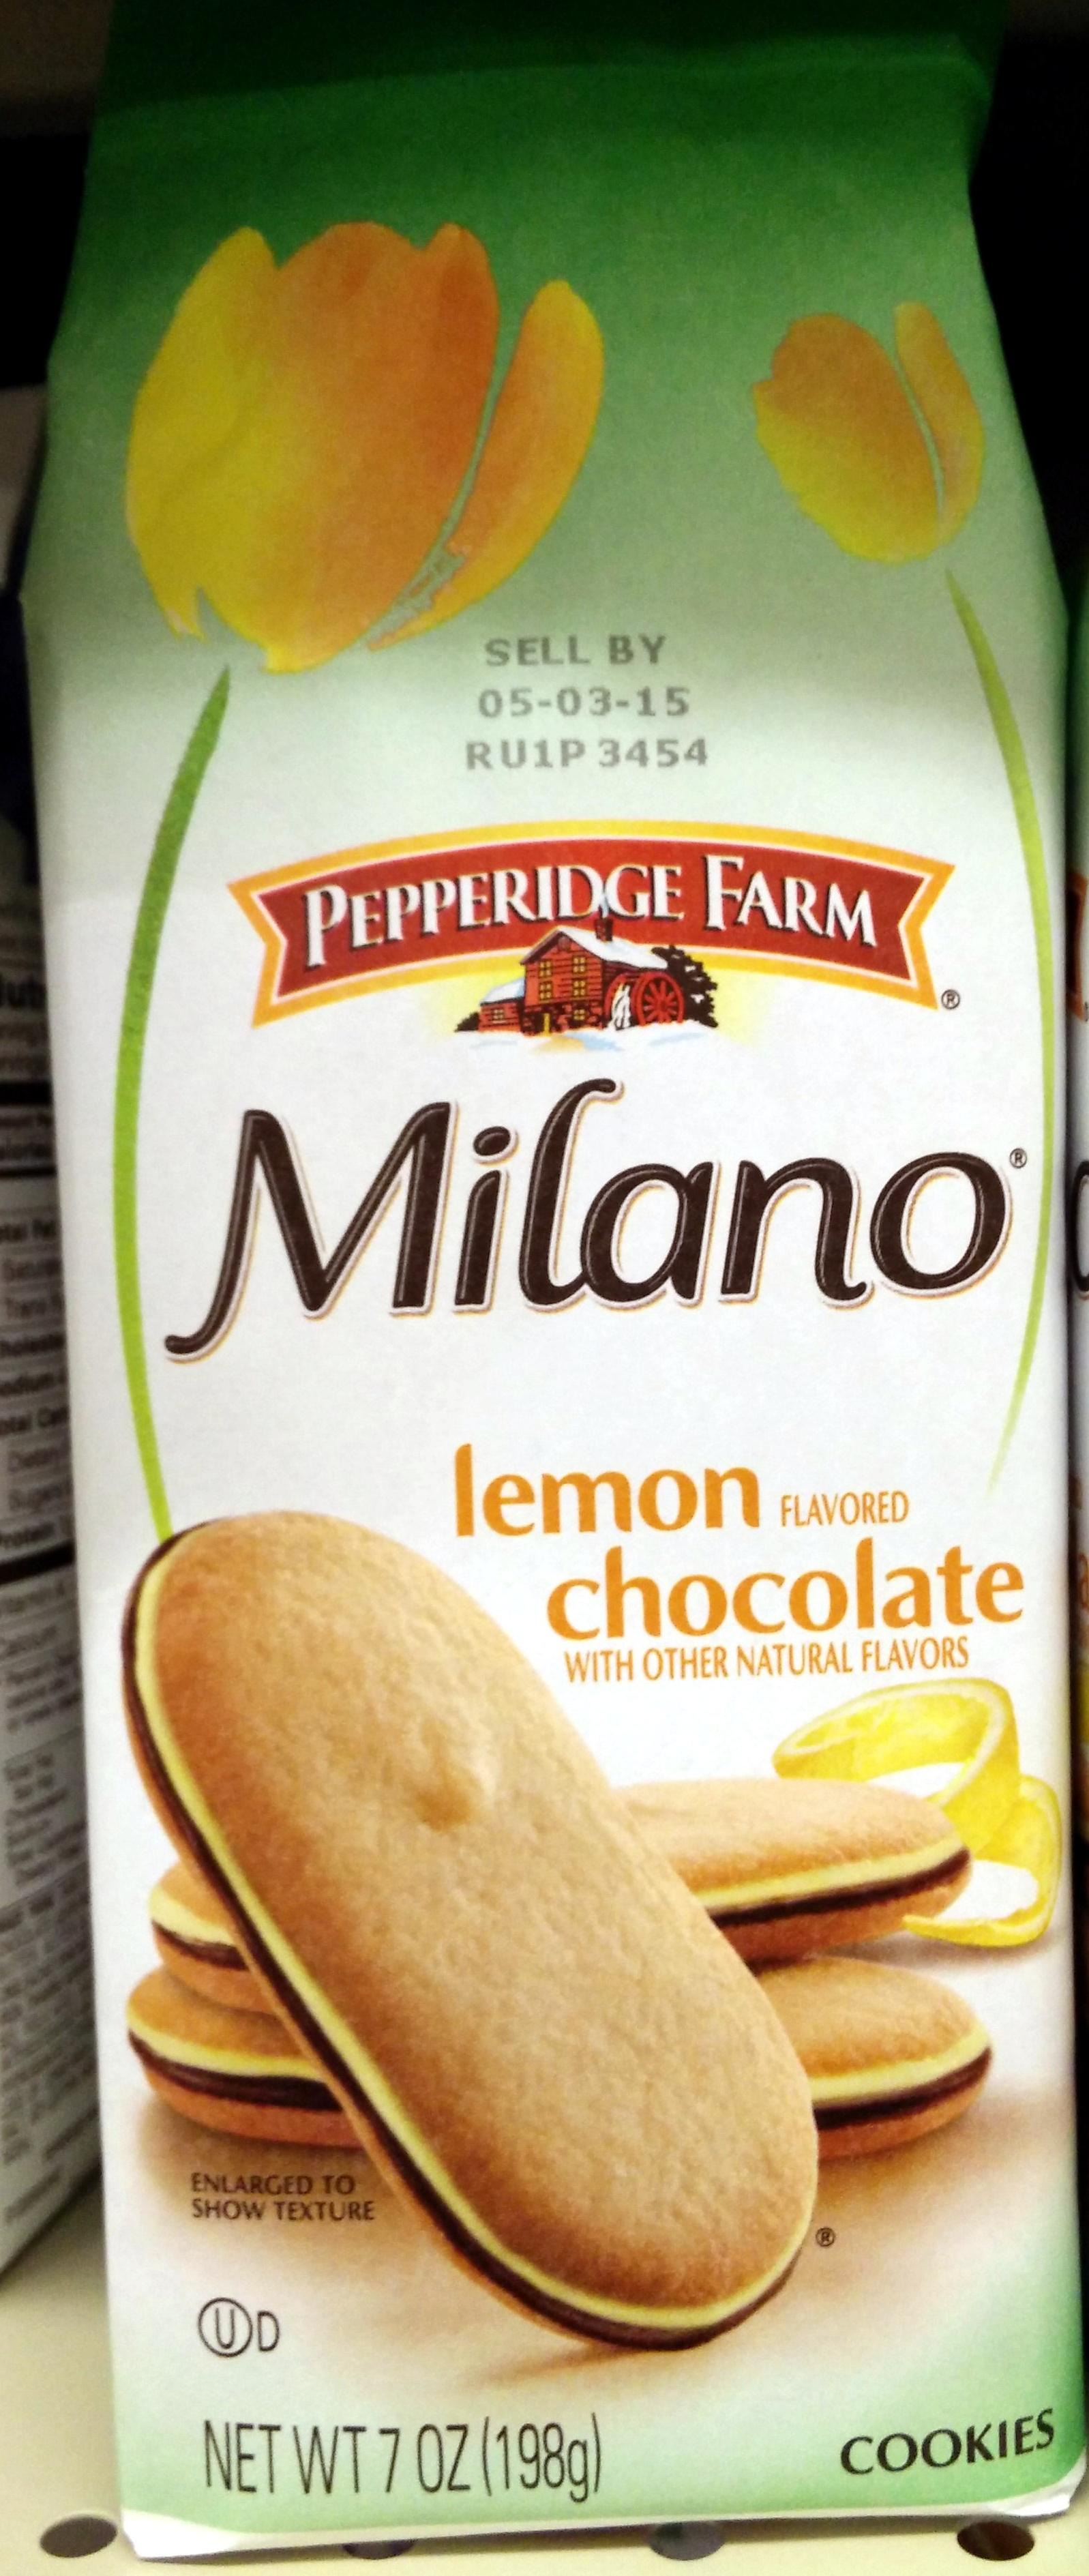 Pepperidge farm cookies lemon - Product - en